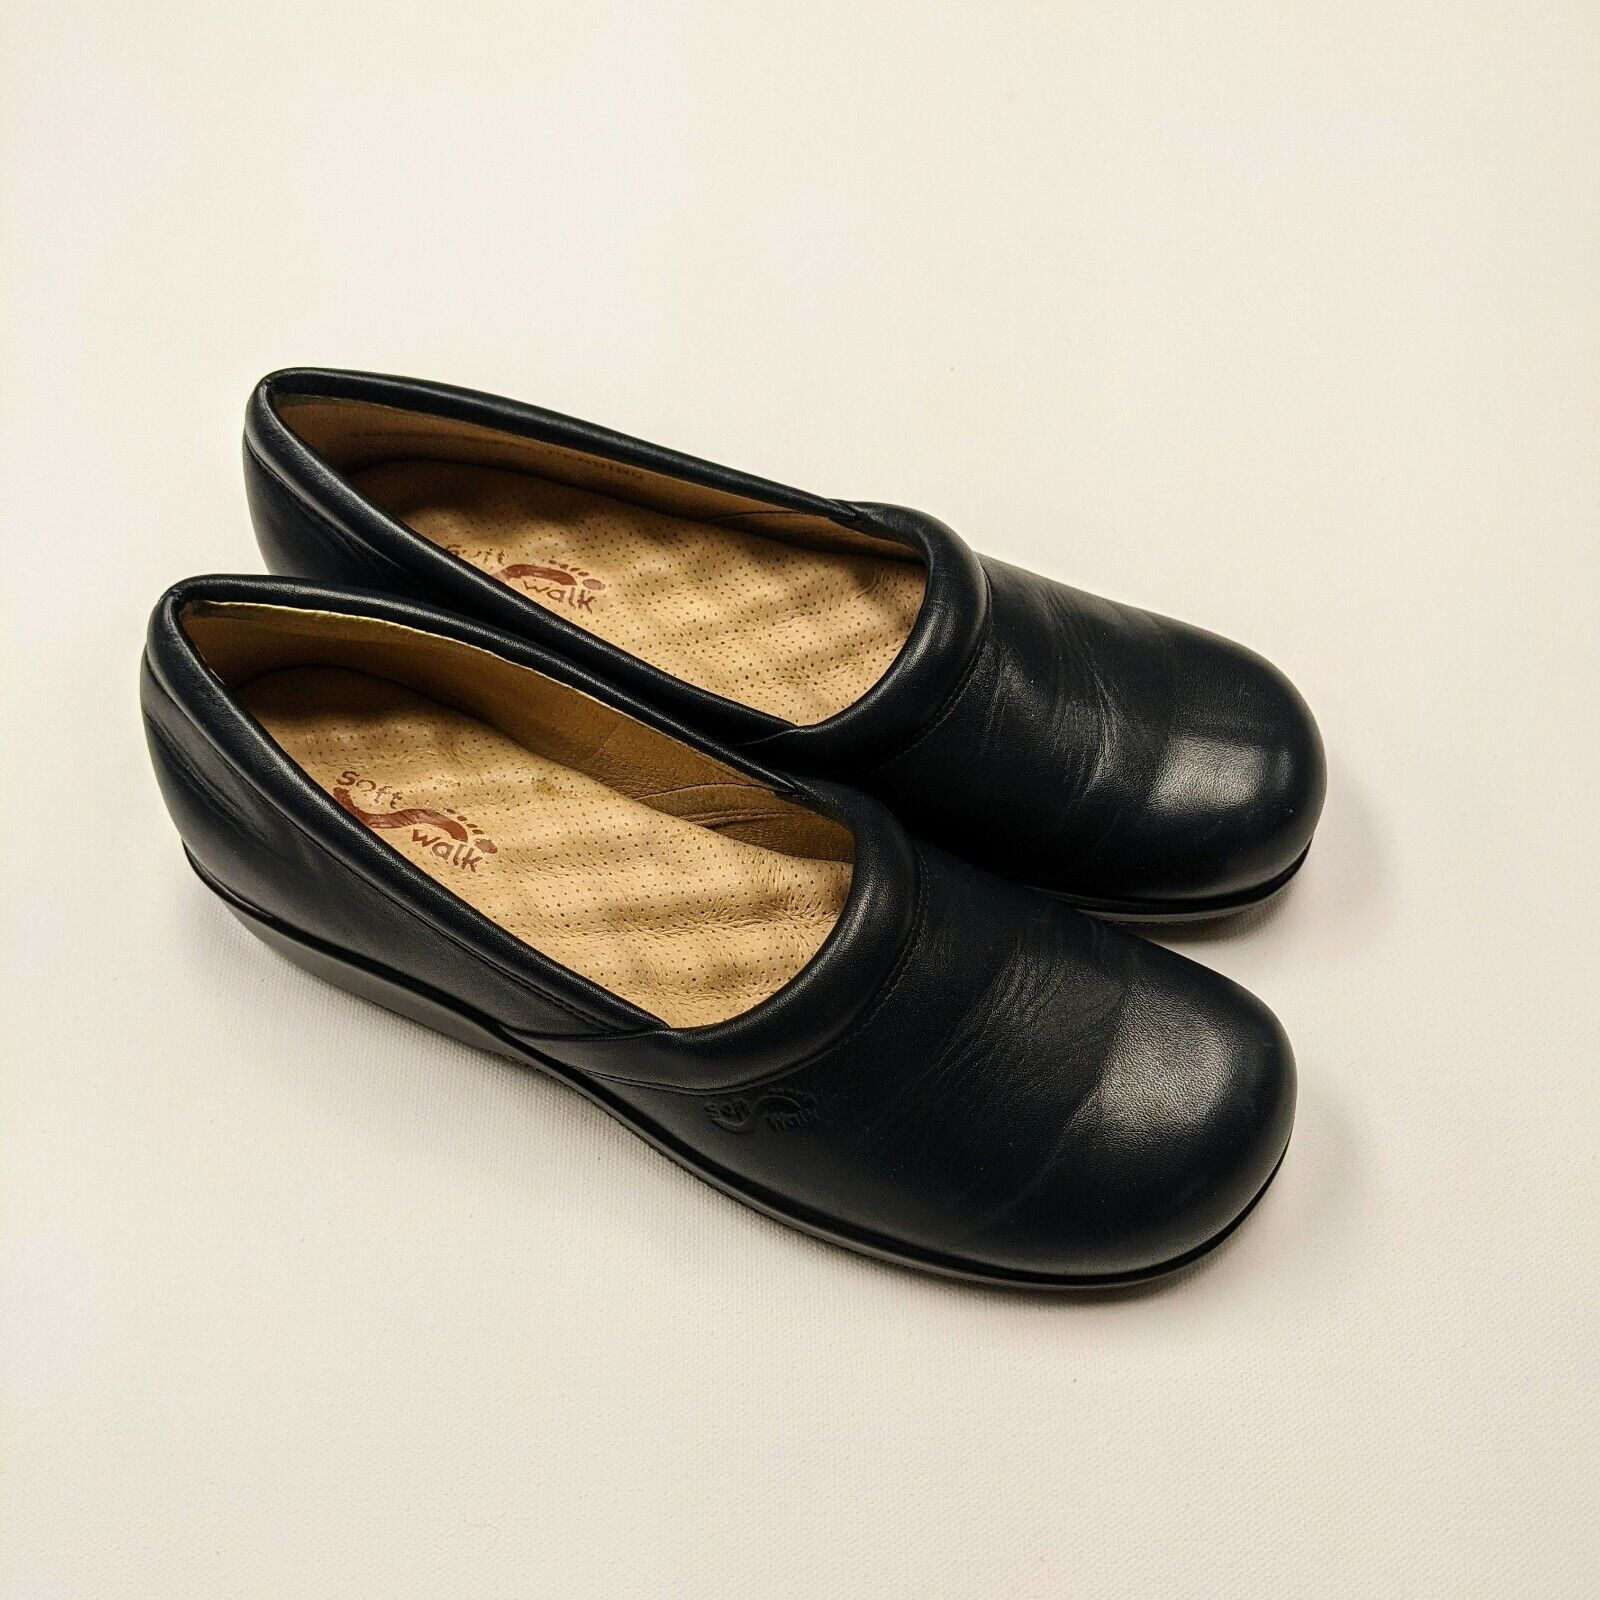 Softwalk Adora Leather Clog Shoes Slip On Shoes Navy 9N